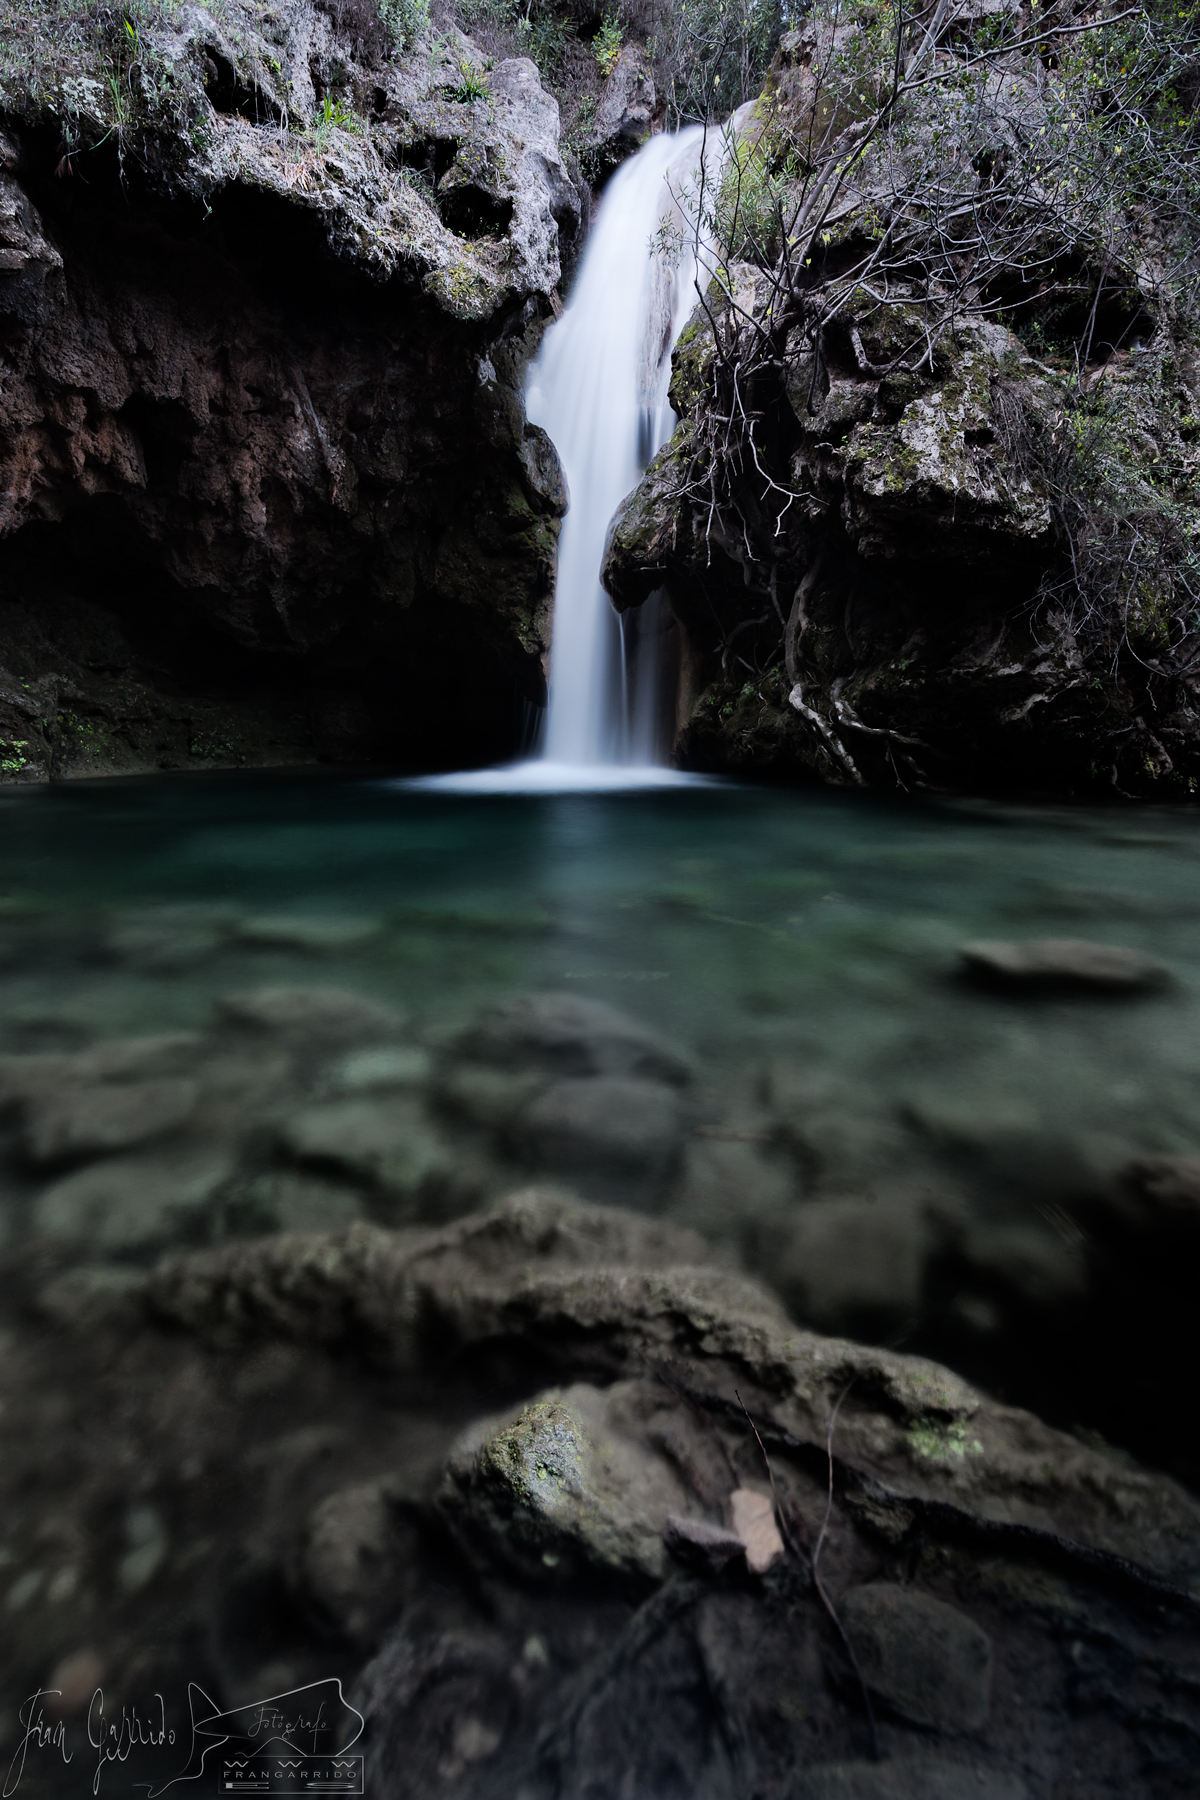 Cascada de Puente Palo